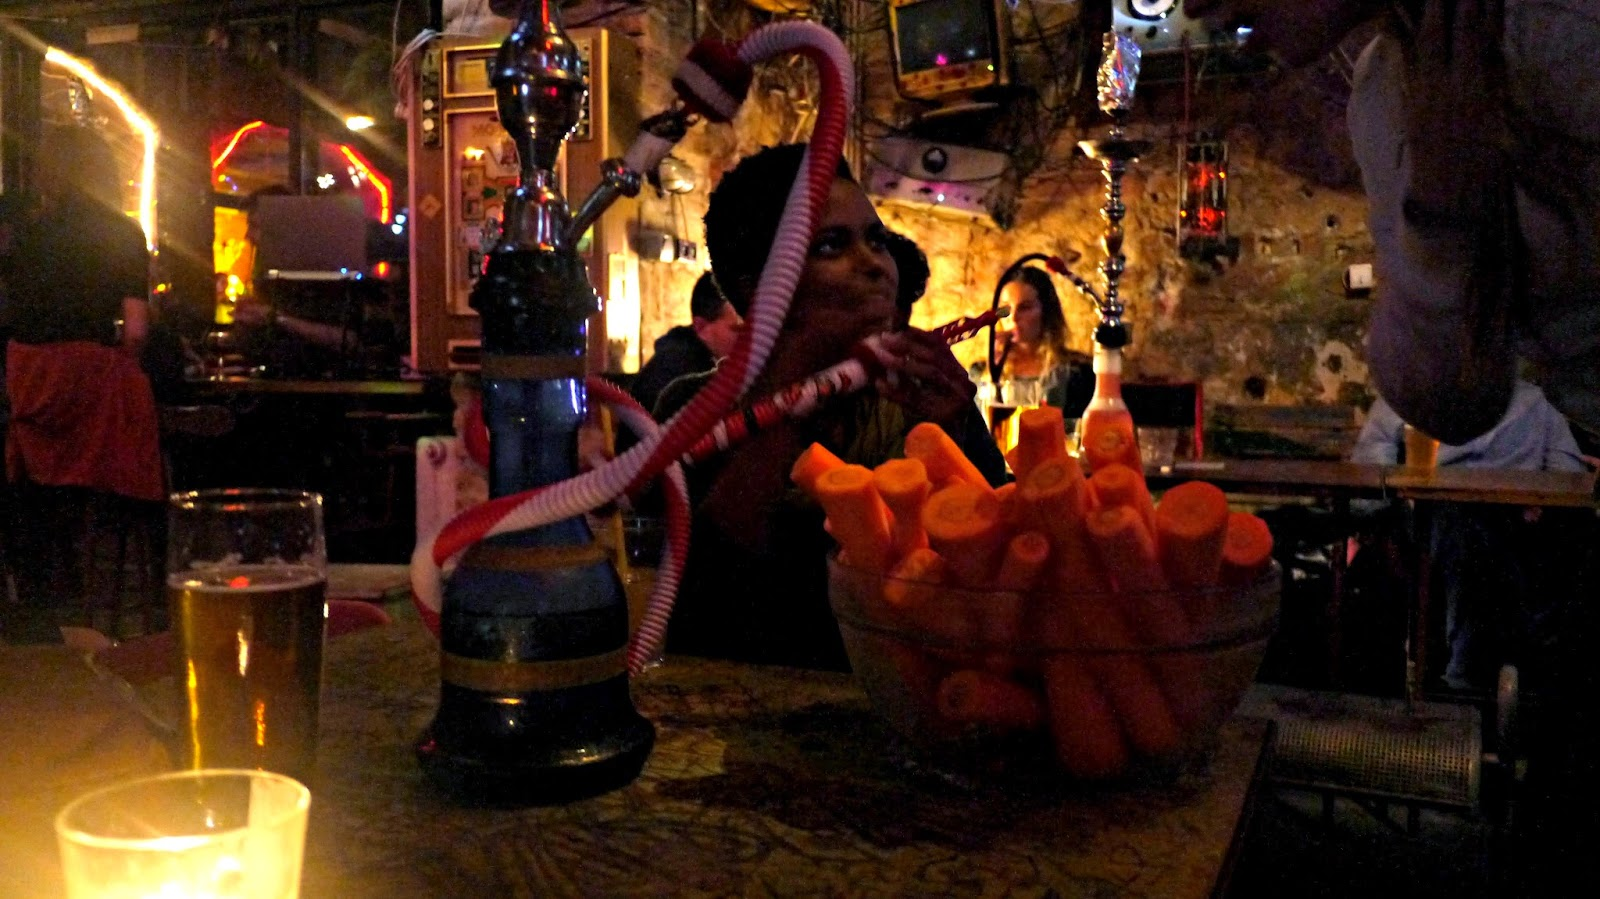 Szimpla Kert budapest ruin bar carrots